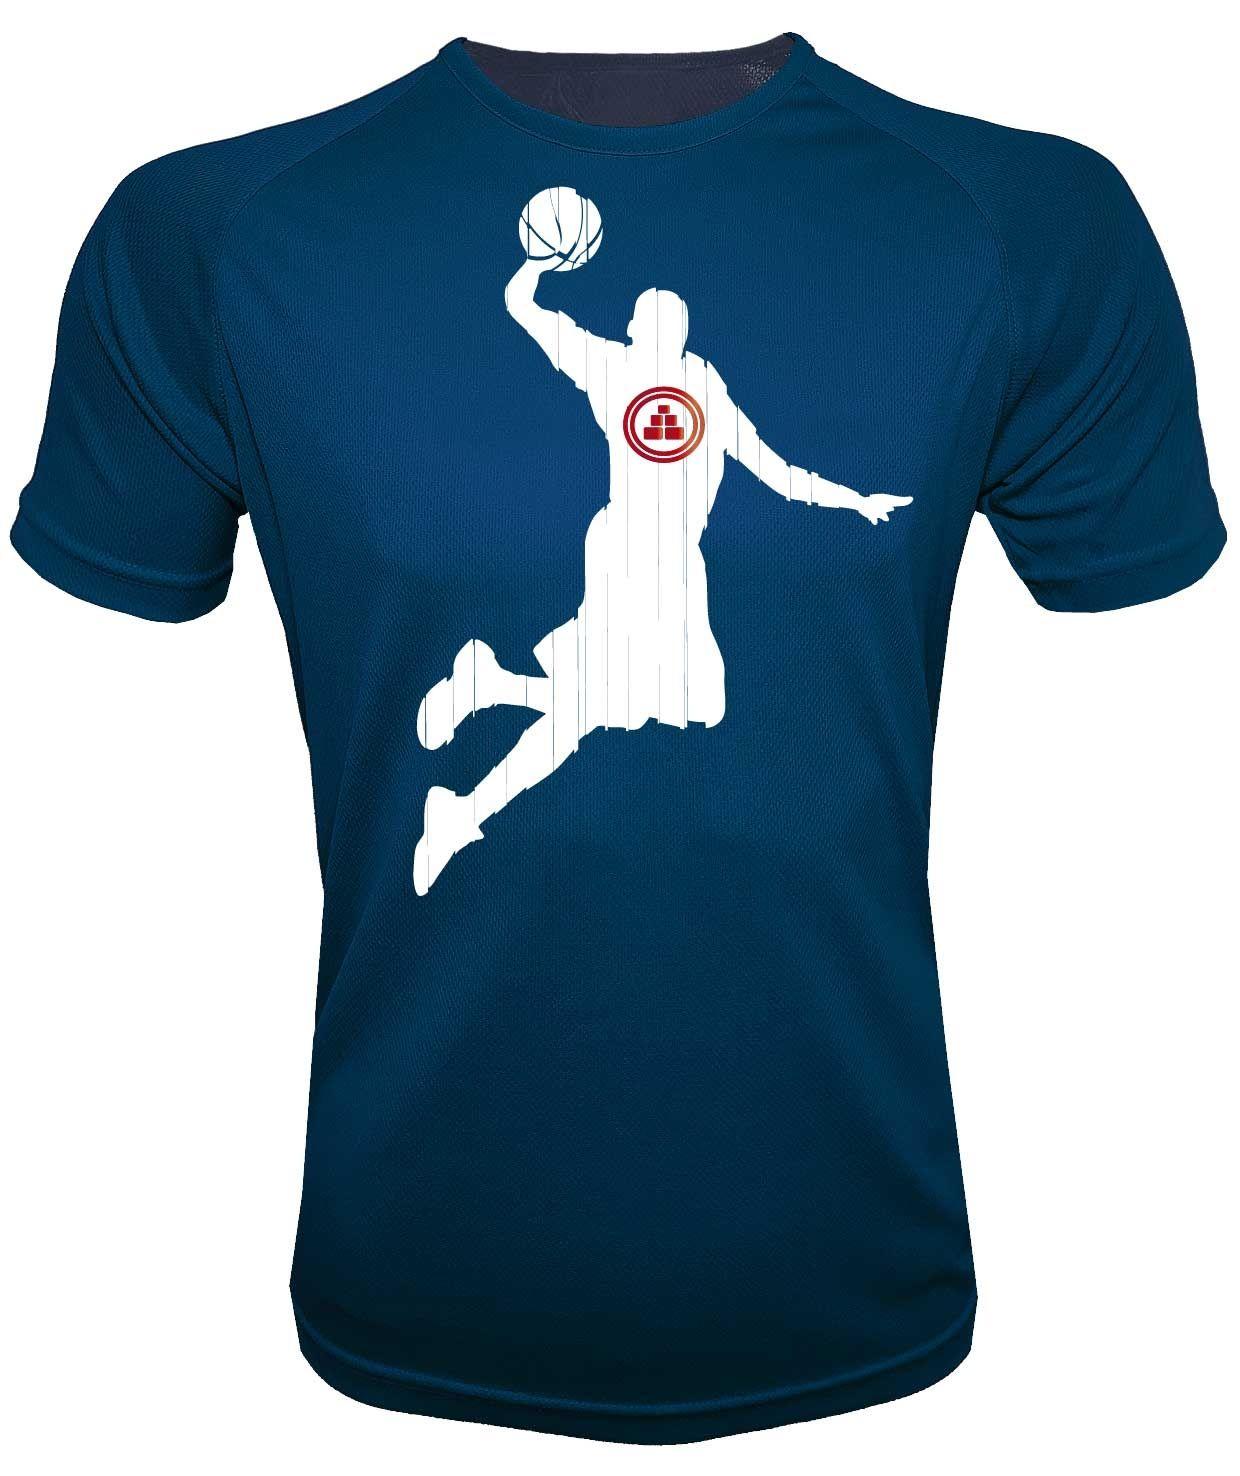 Camiseta deportiva básquet